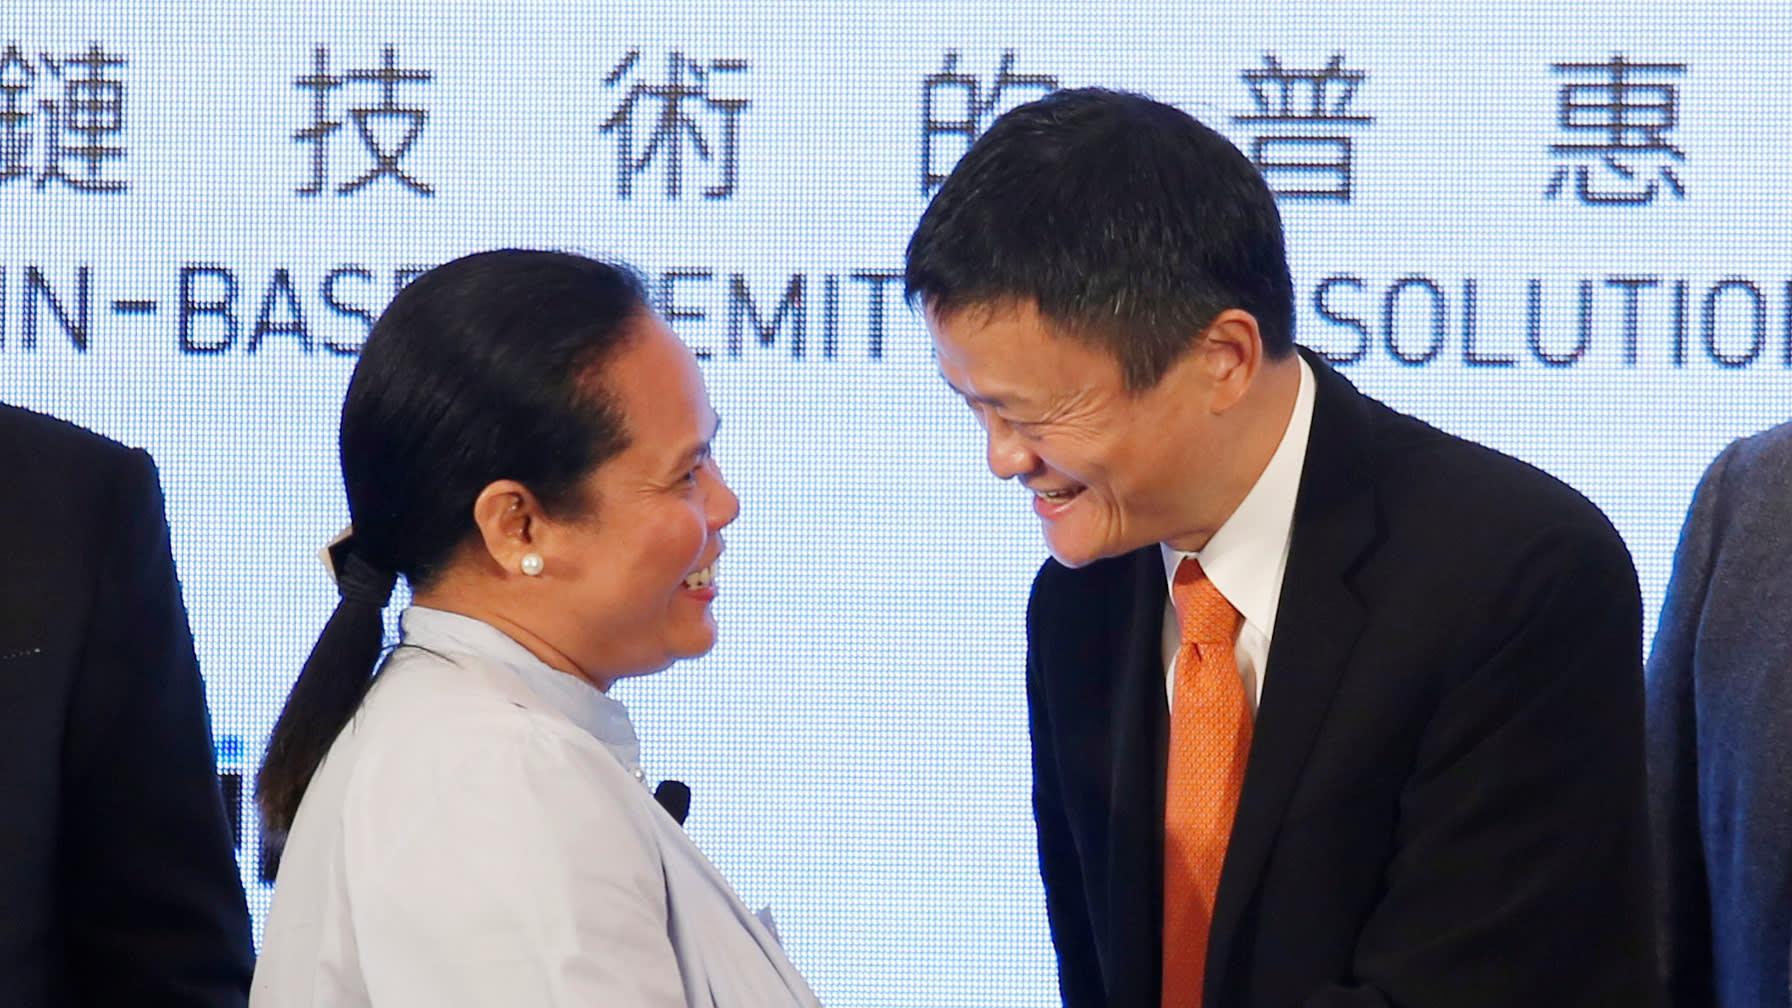 Alibaba Group's Jack Ma, right, greets aFilipino guestat a news conference Monday